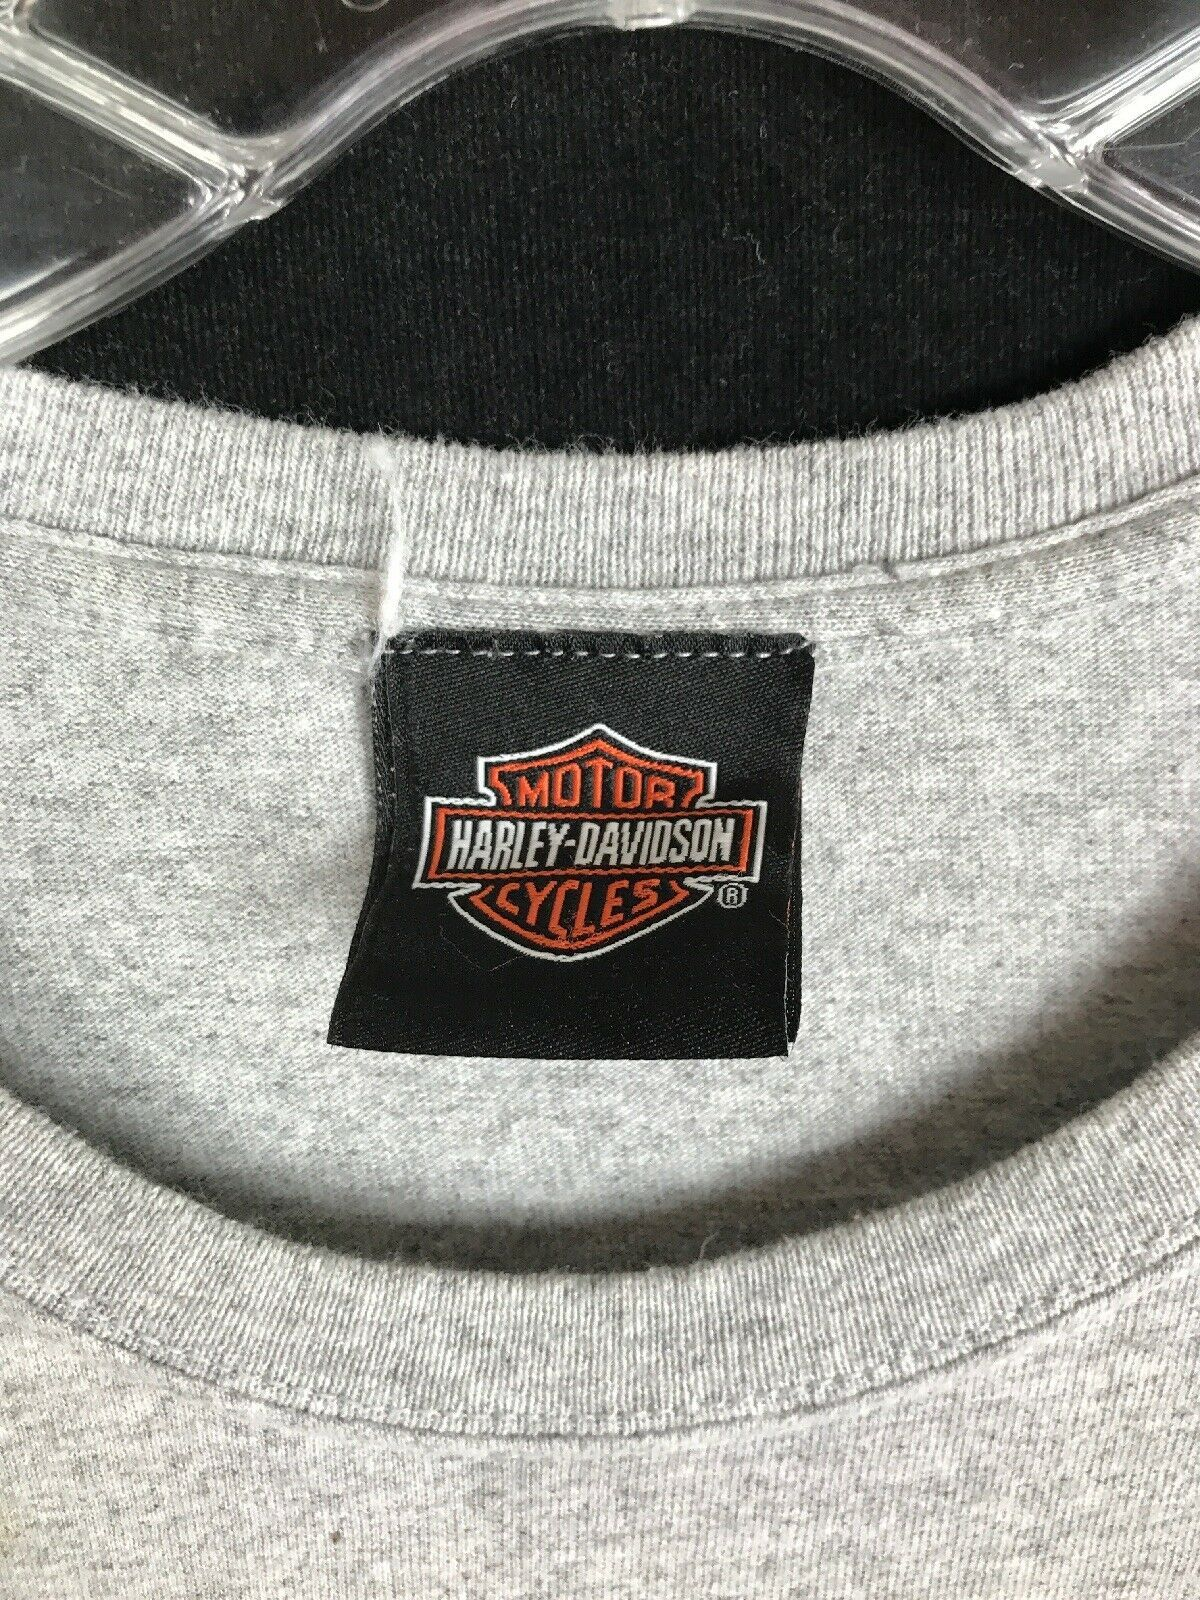 XL HOG Harley Owners Group Davidson Gray T Shirt 2010 Sturgis image 4